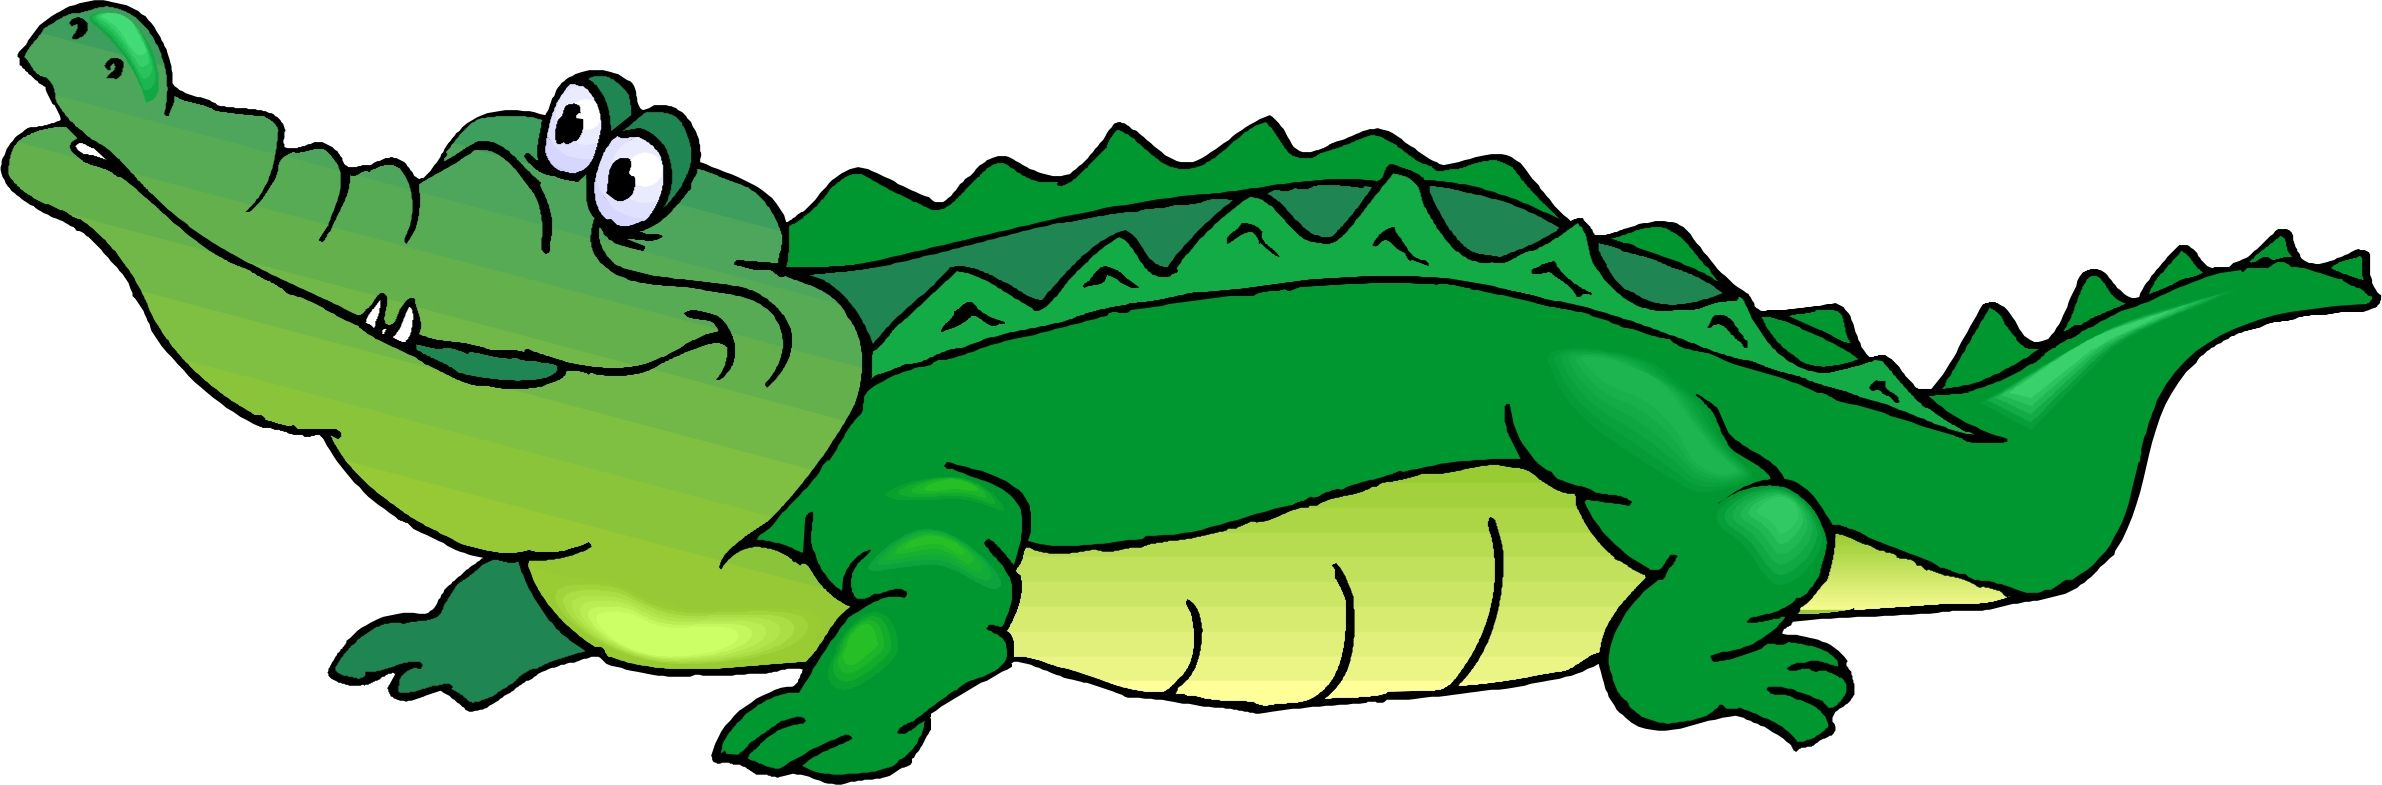 Gator clip art use. Back clipart crocodile